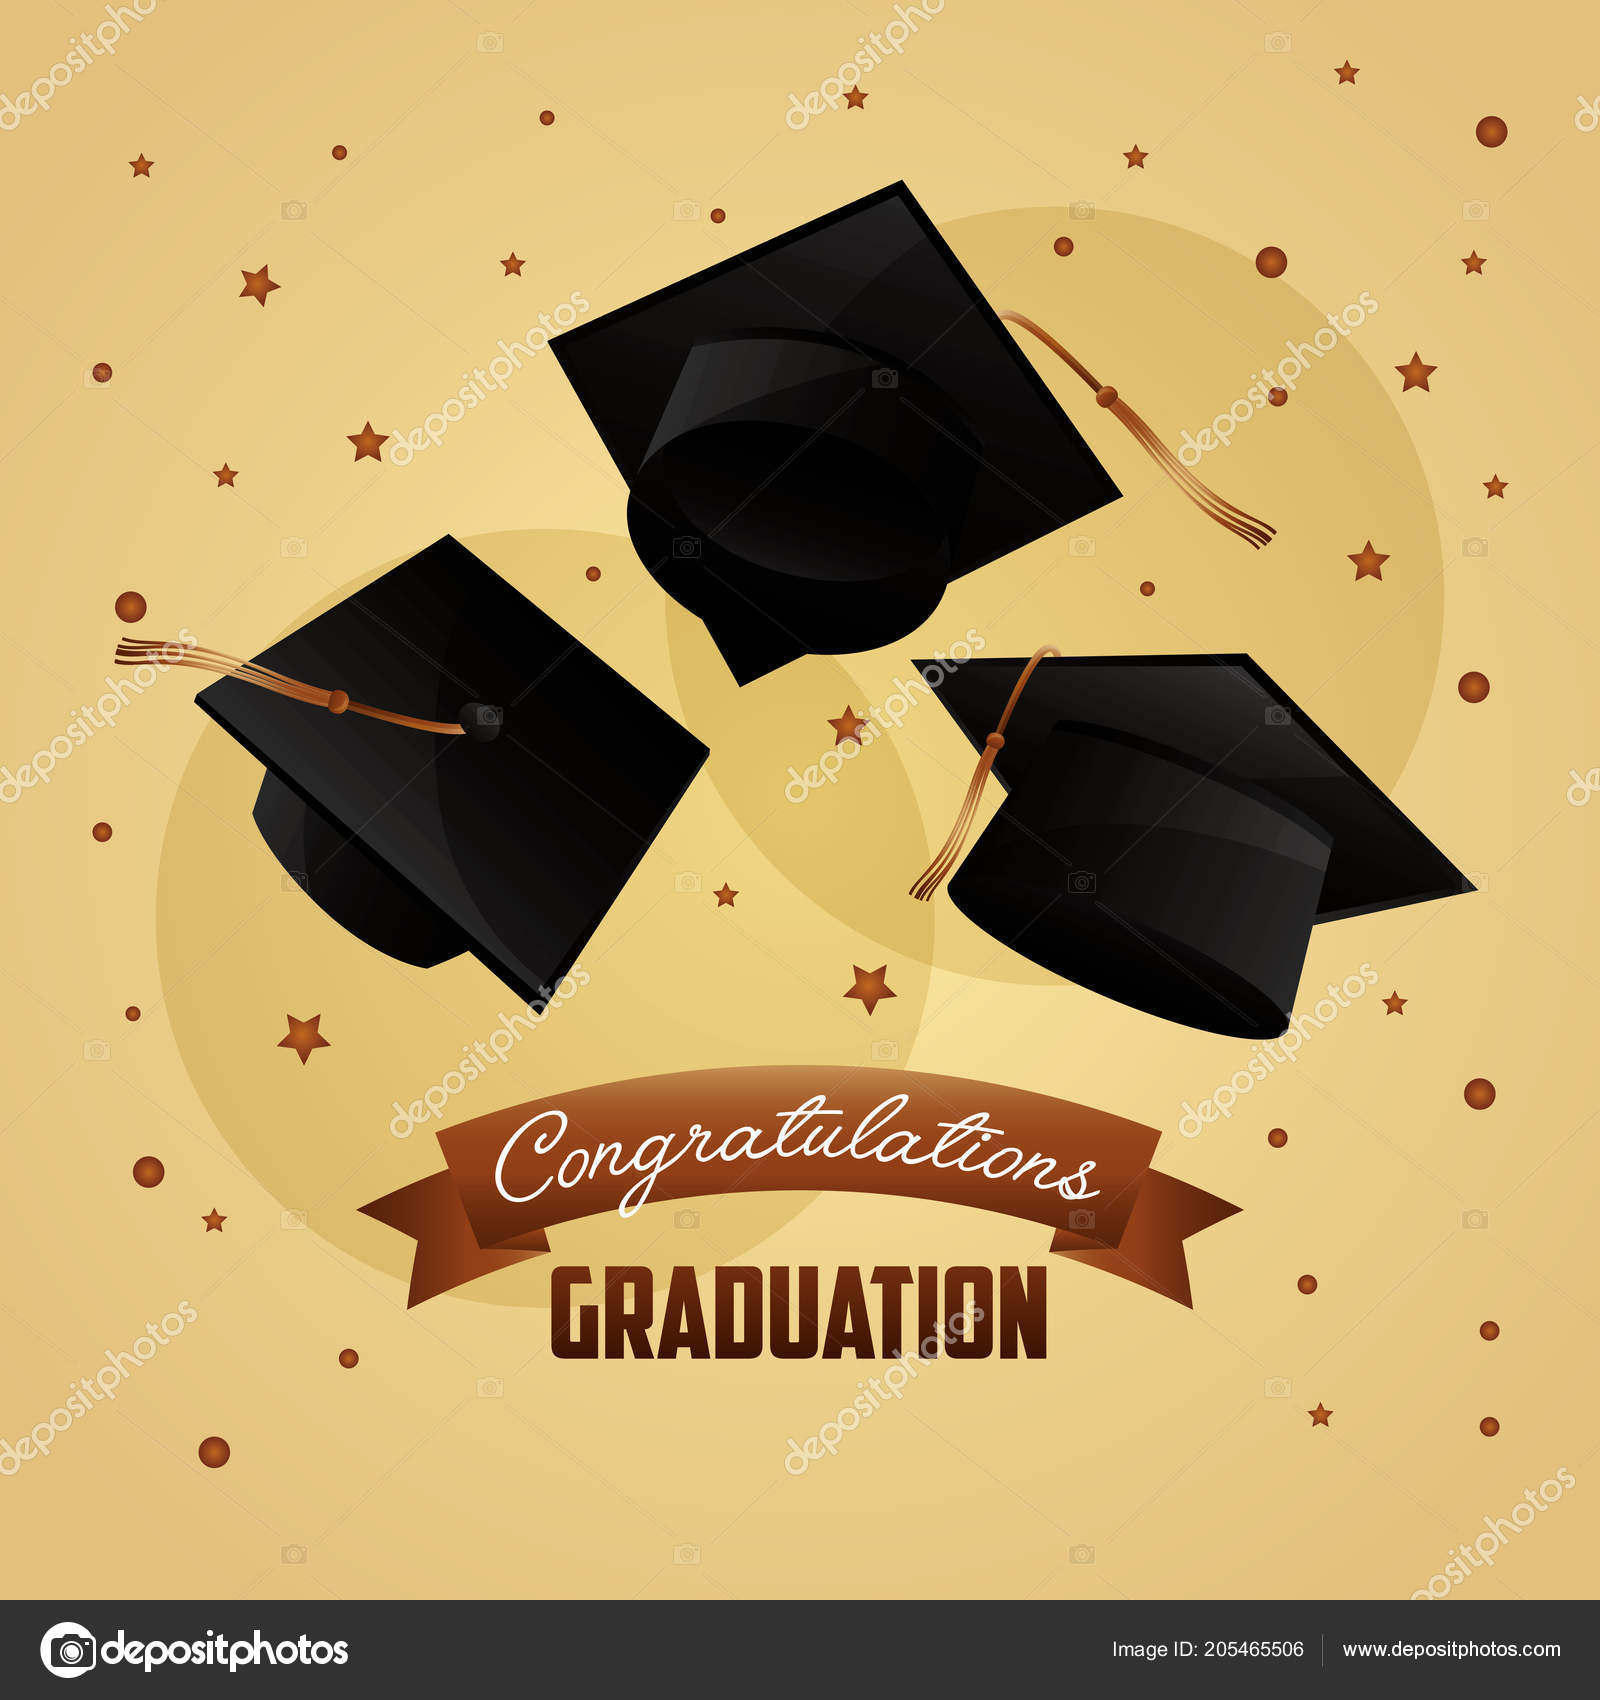 Congratulations Graduation Card Stock Vector C Yupiramos 205465506